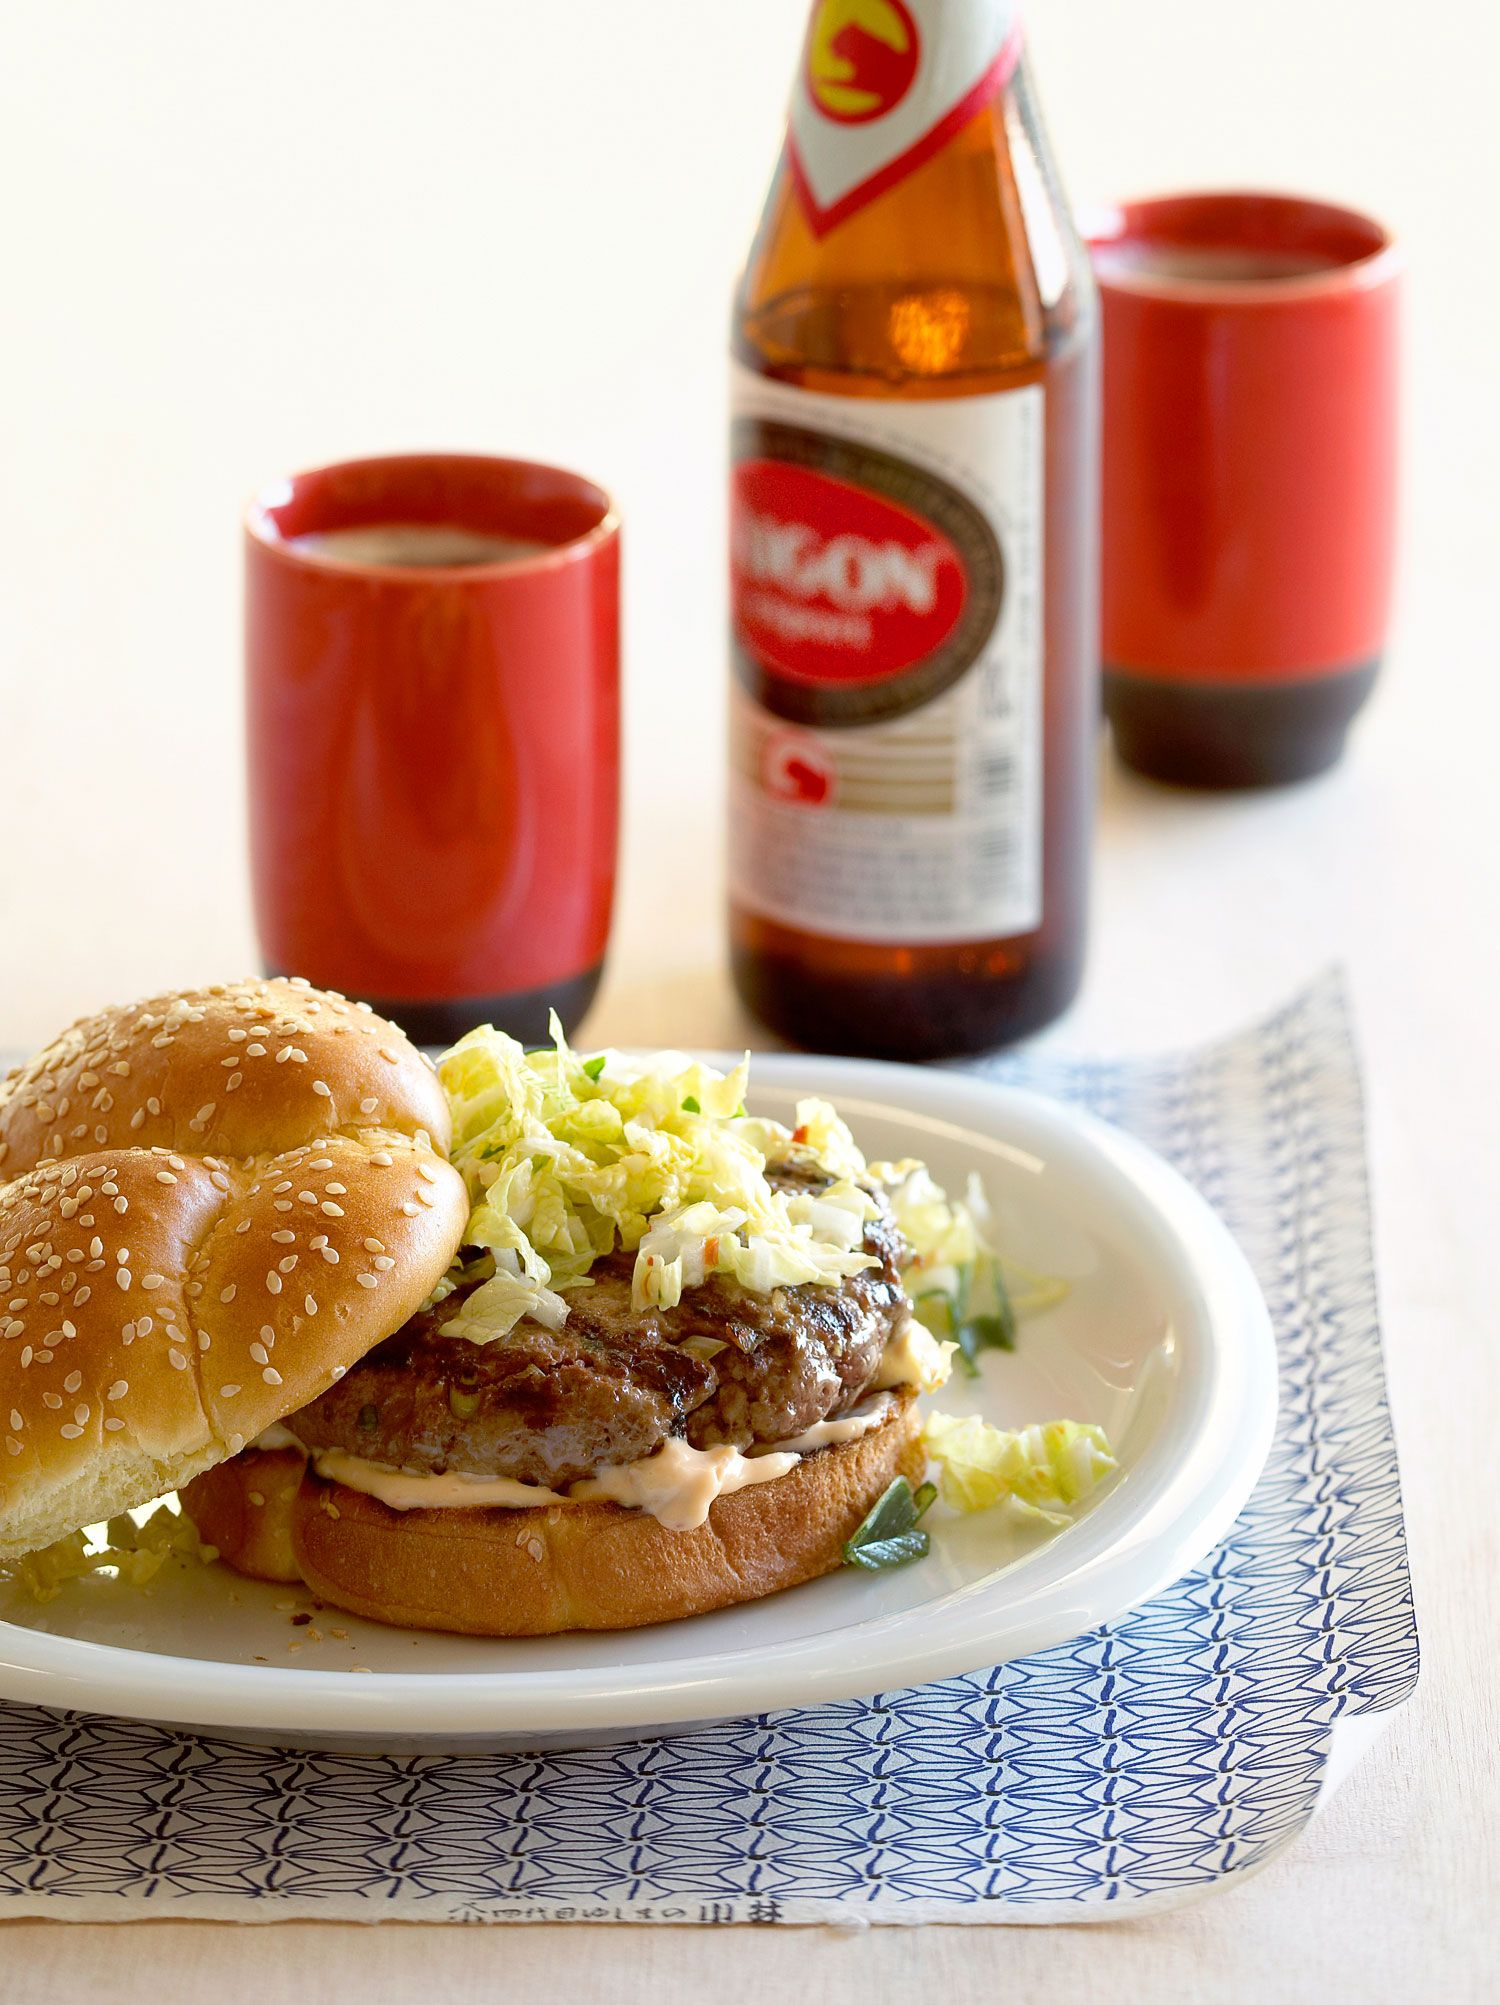 Easy Burger Recipes Delicious Burger Recipes Kimchi Burger Delicious Burgers